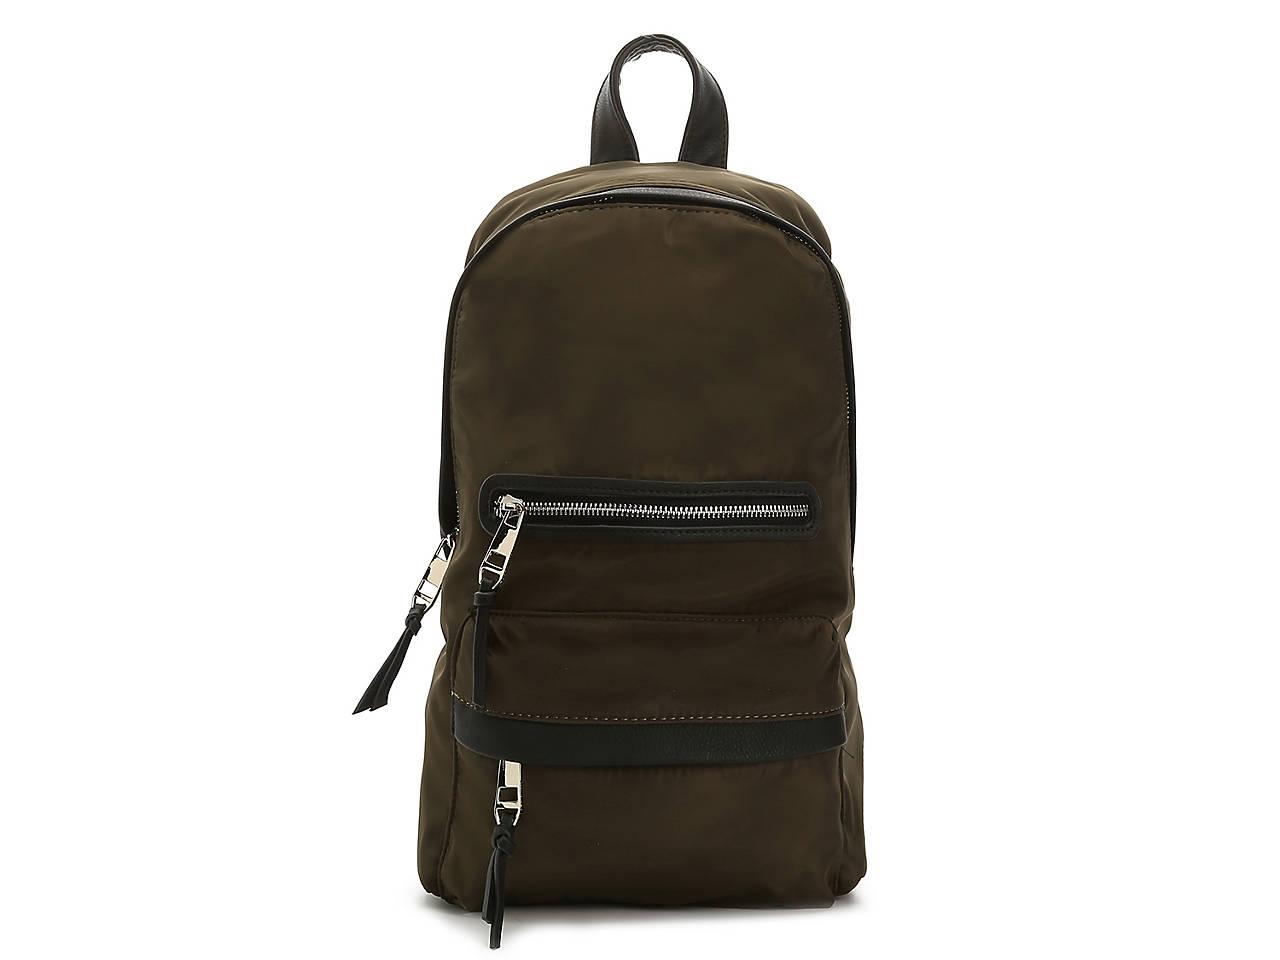 Madden Girl Tower Backpack Women's Handbags & Accessories | DSW